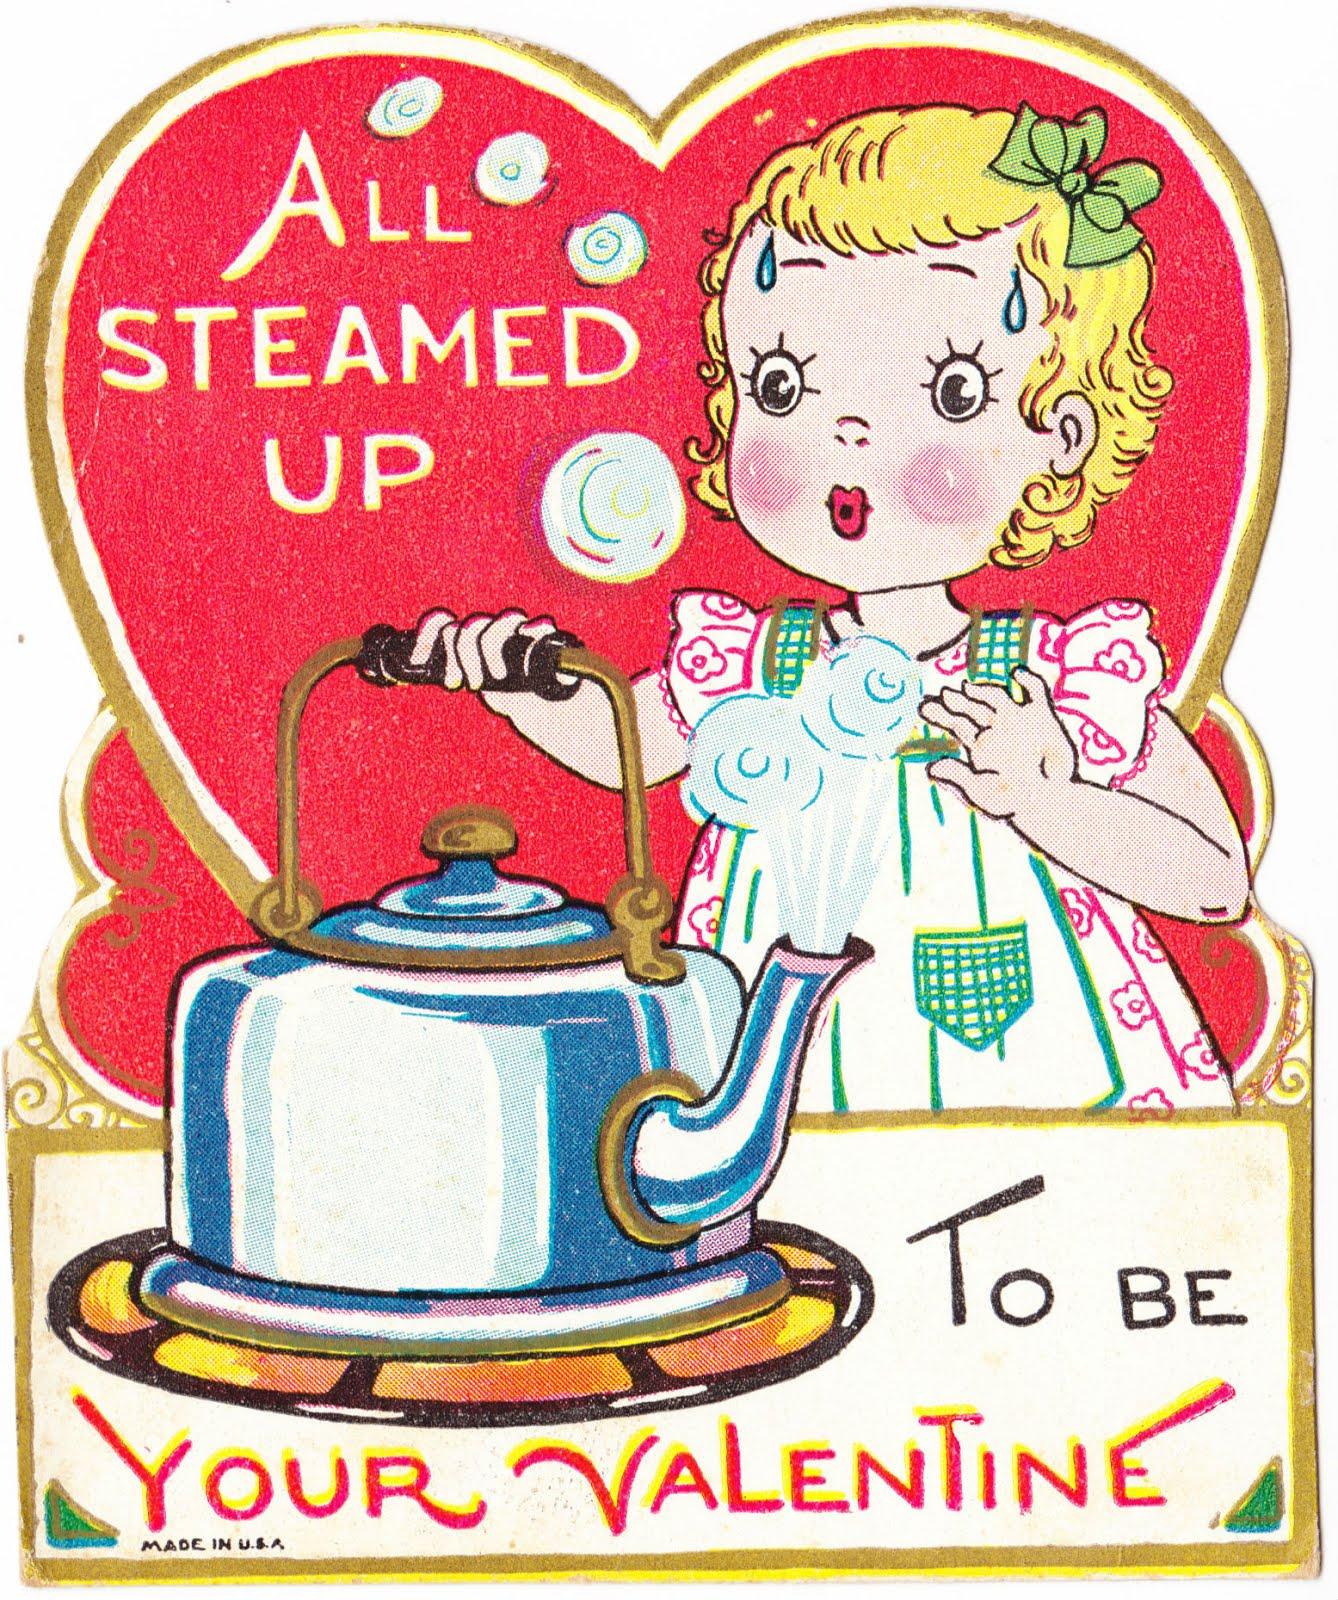 'All Steamed Up' Valentine - date unknown